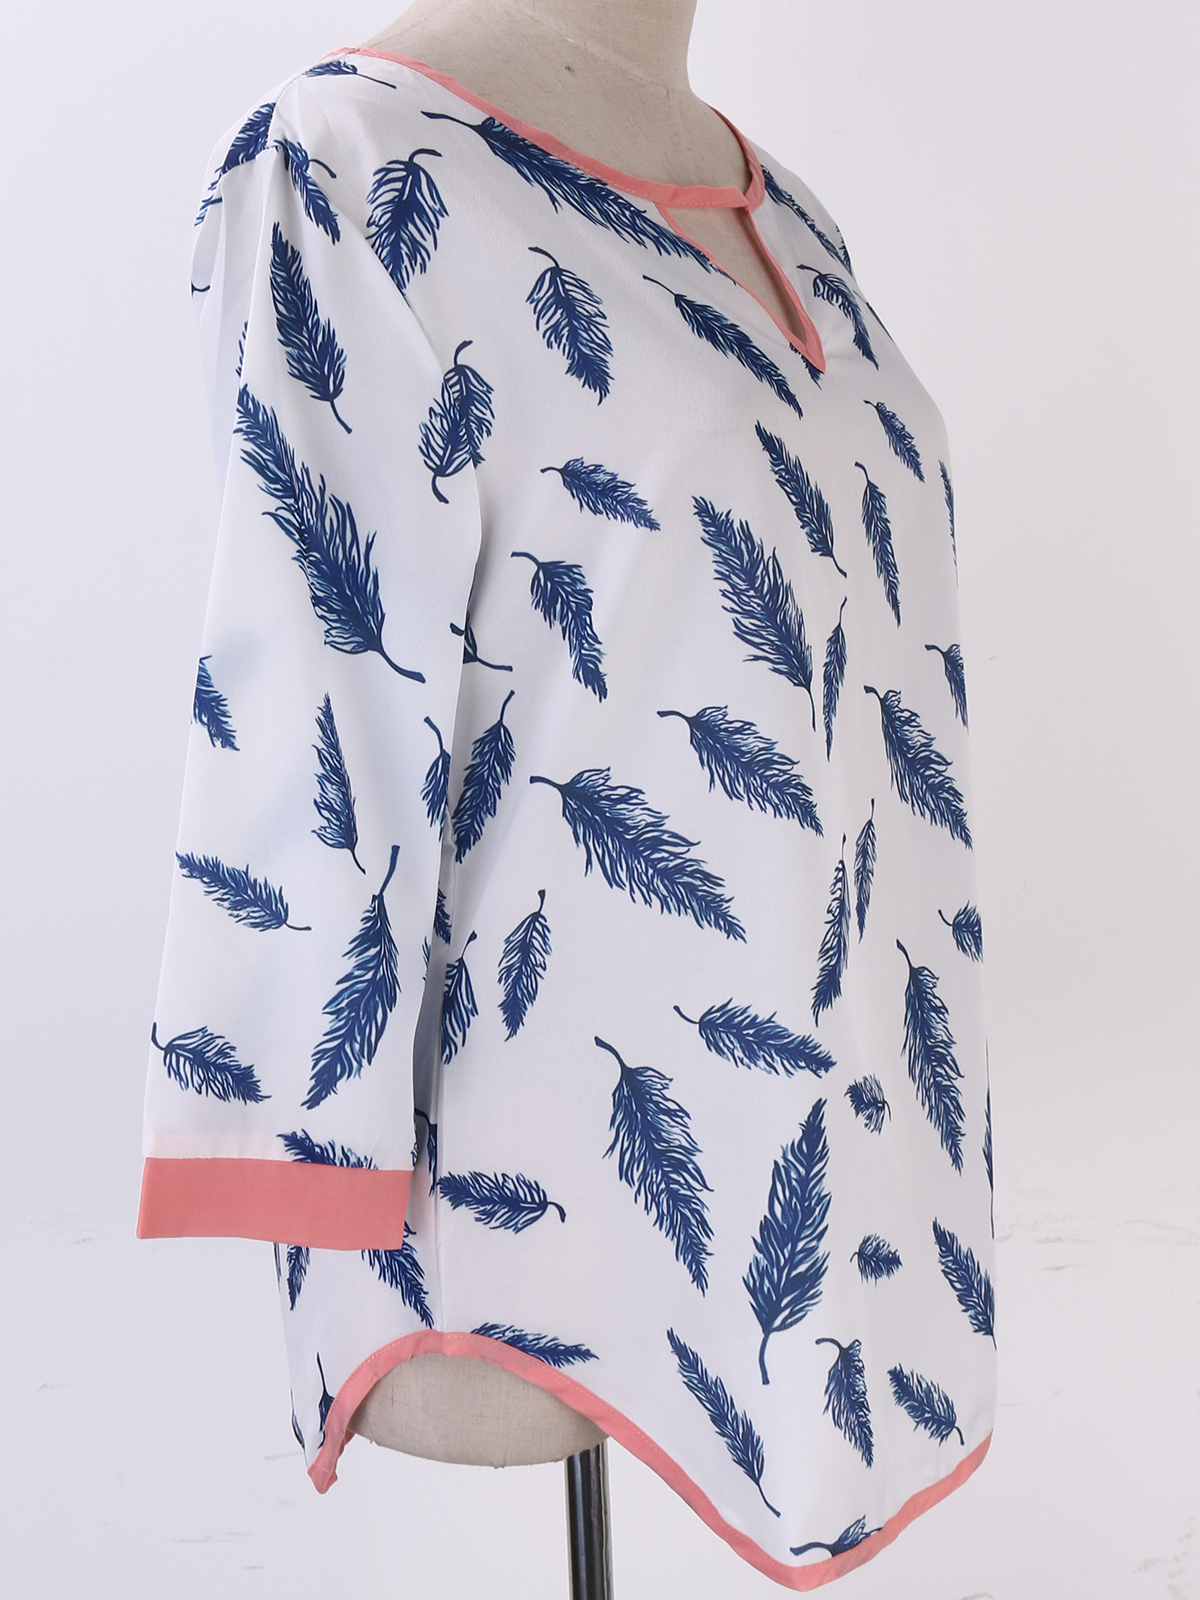 NEW Womens Blouse New Chiffon three quarter Sleeve Ladies Top shirt Loose Short Tops